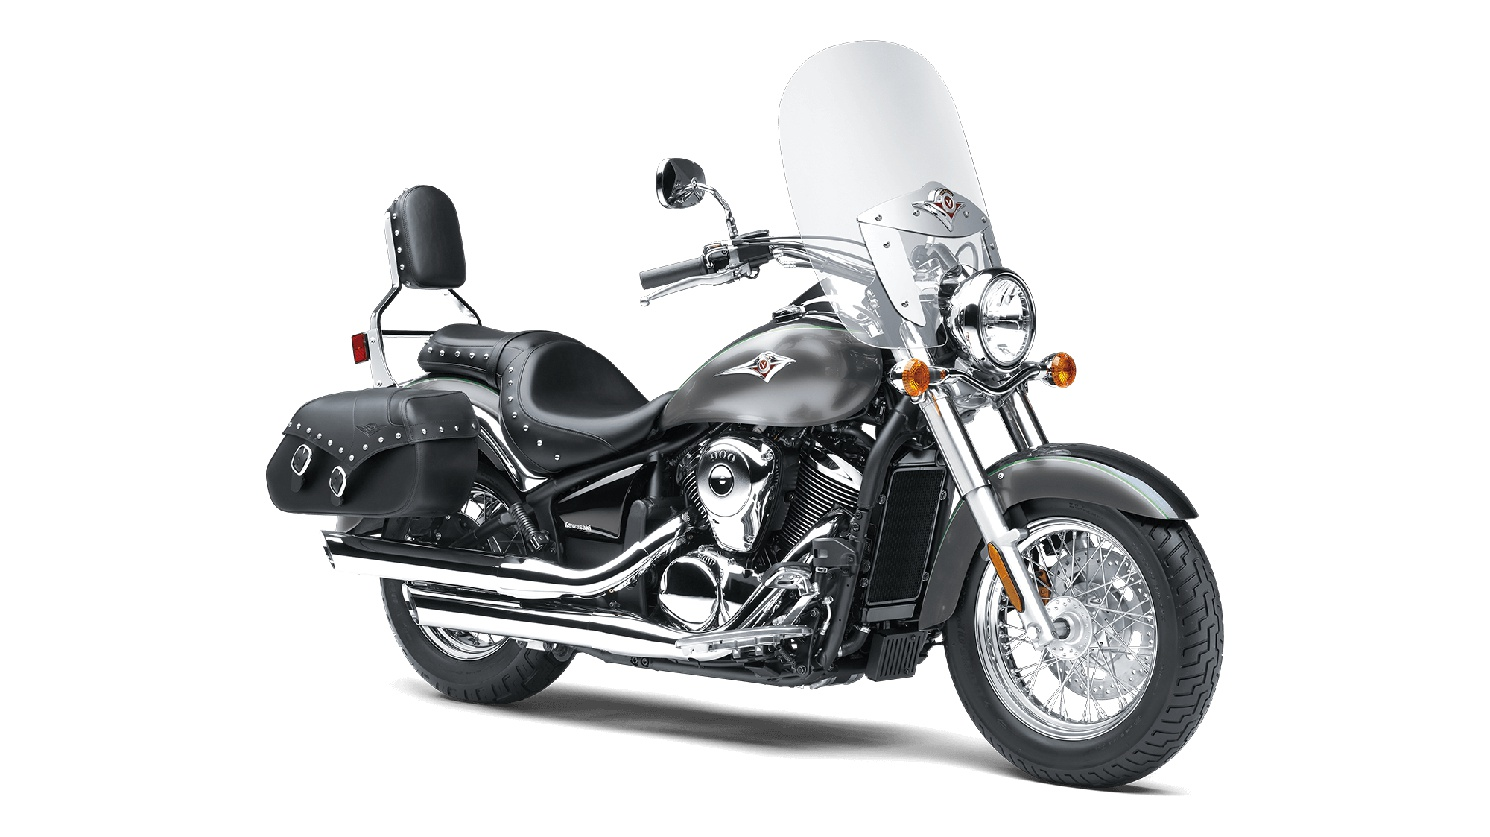 Kawasaki VULCAN 900 CLASSIC LT Argent Furtif Métallisé/Gris Carbone Métallisé 2020